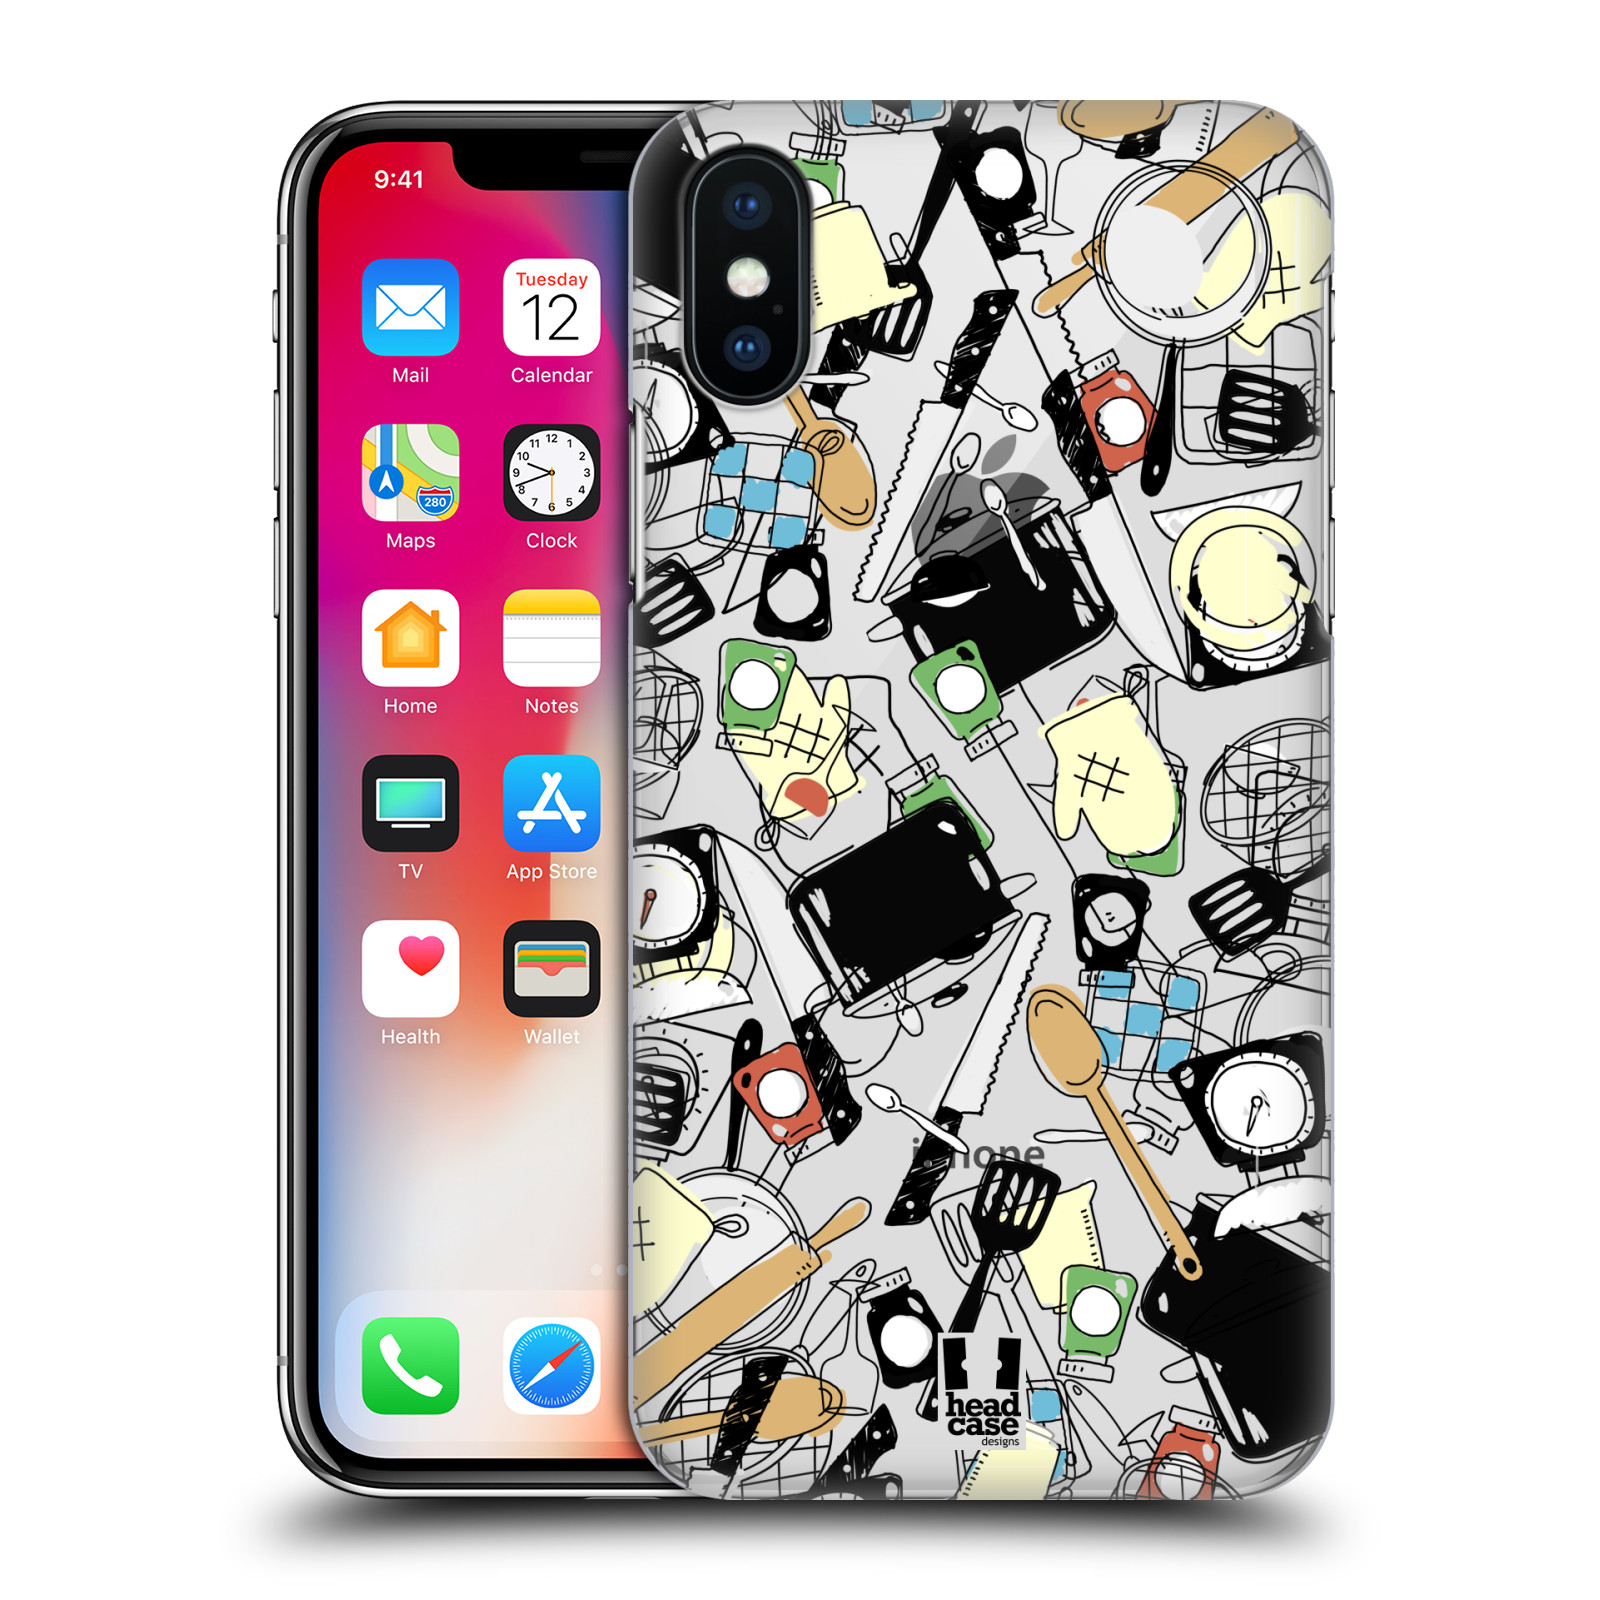 HEAD-CASE-DESIGNS-DOODLE-PROFESSIONS-HARD-BACK-CASE-FOR-APPLE-iPHONE-PHONES